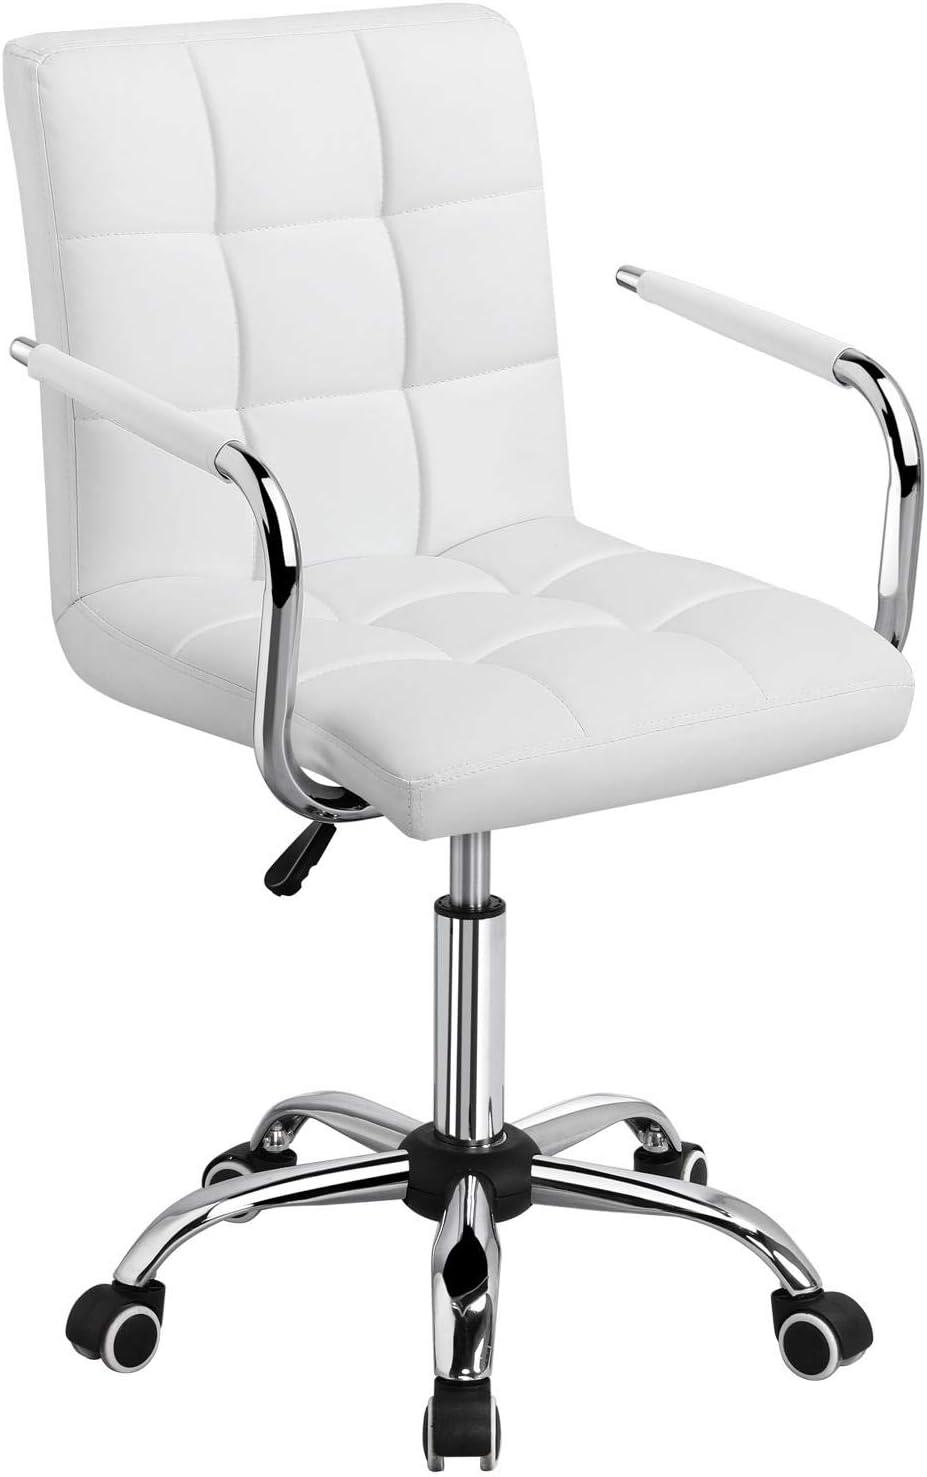 Yaheetech Silla de Oficina Giratoria Taburete de Trabajo Bar Altura Ajustable Carga MAX 120Kg con Respaldo Blanco